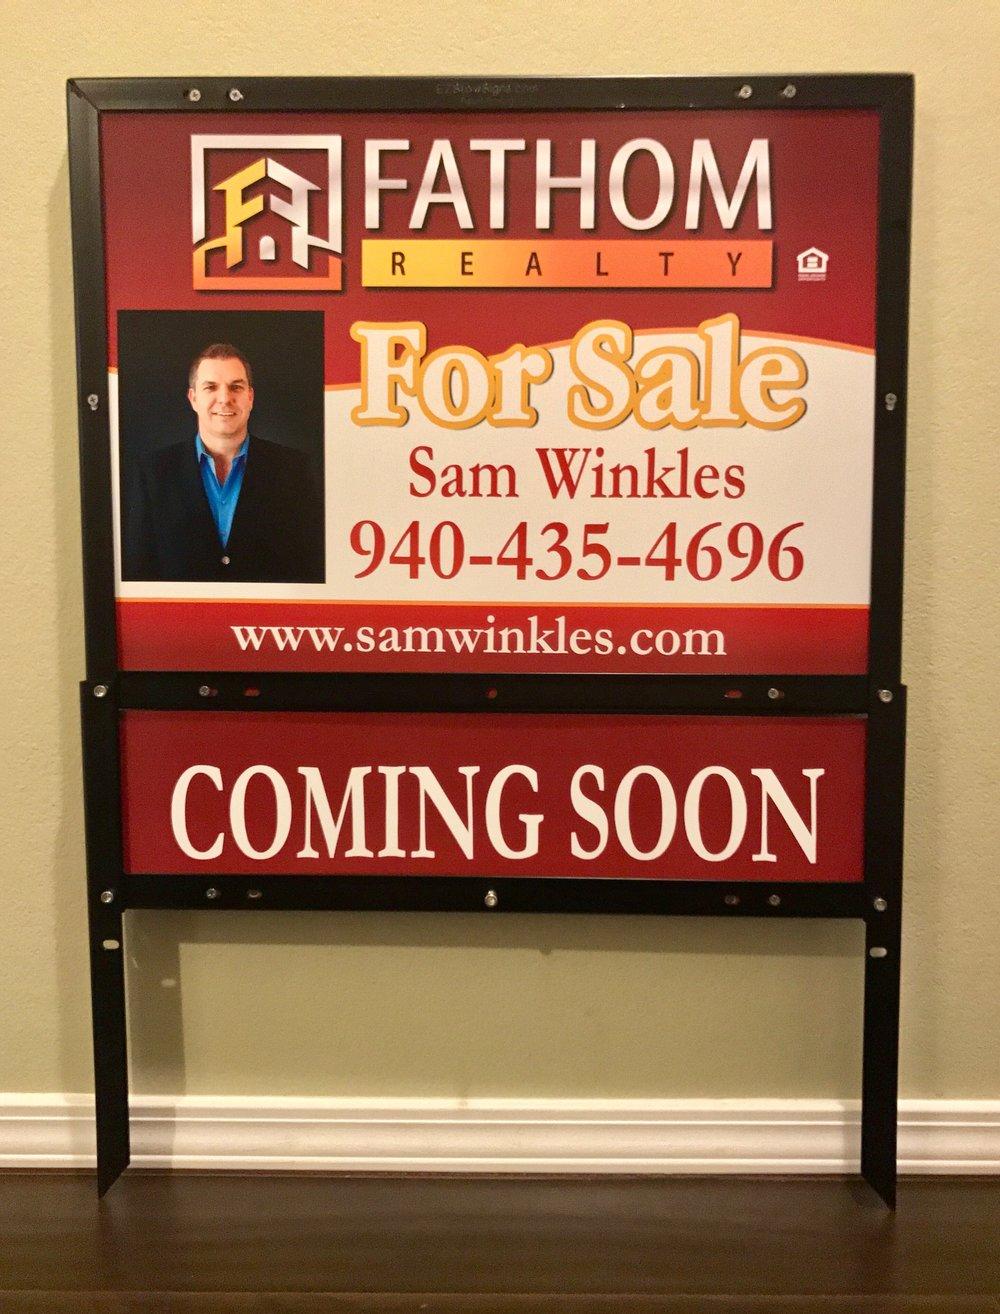 Winkles Sam-Fathom Realty.jpg